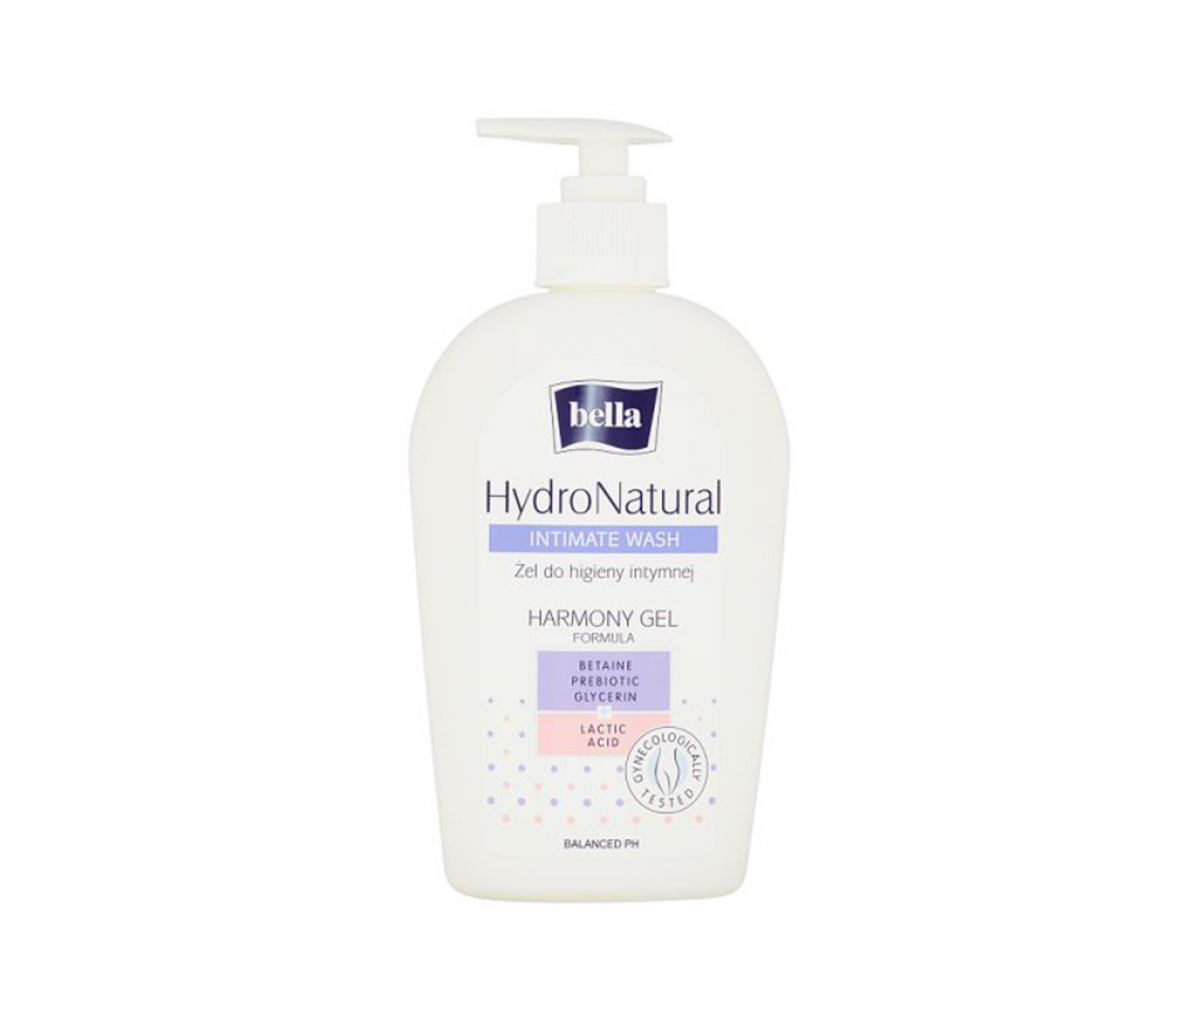 TZMO HydroNatural Intimate Wash